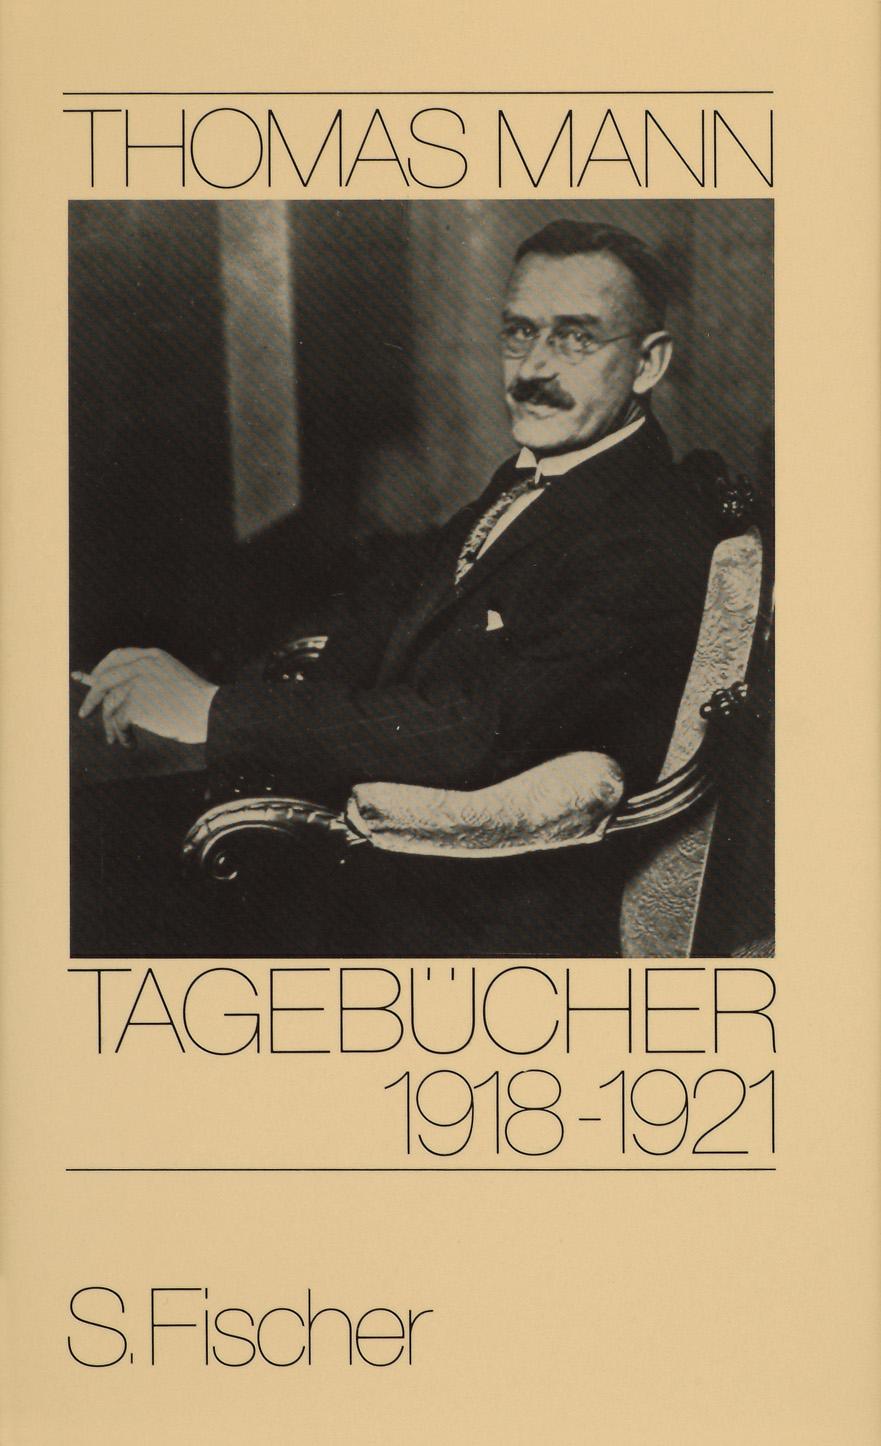 Thomas Mann, Tagebücher: Tagebücher, 1918-1921 - Thomas Mann